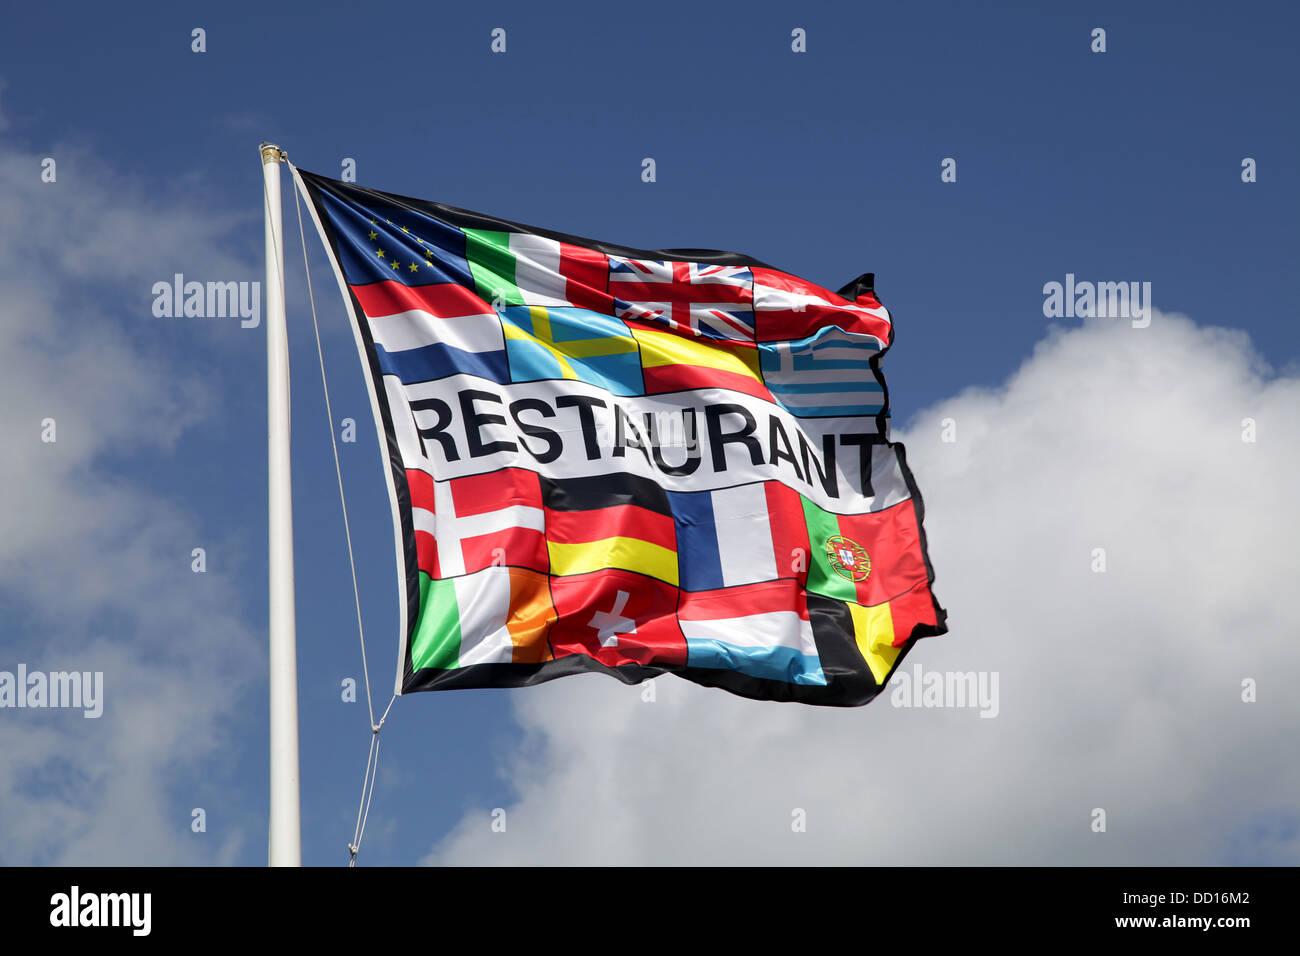 Restaurante El restaurante bandera.banner.blue sky.bandera europea.europa.eu. Imagen De Stock